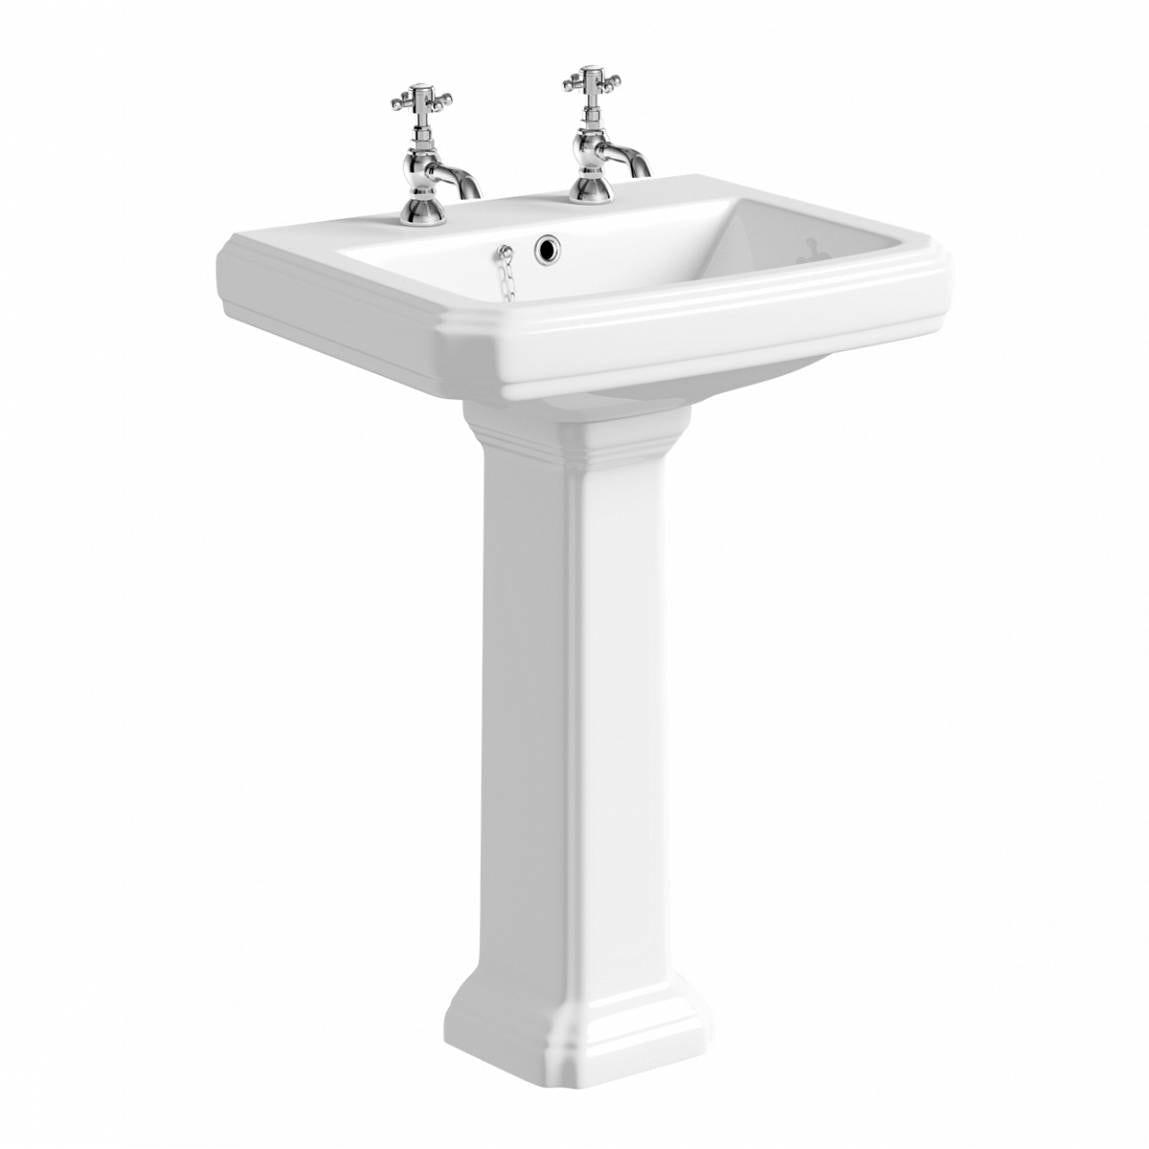 Dulwich 2 tap hole full pedestal basin 600mm